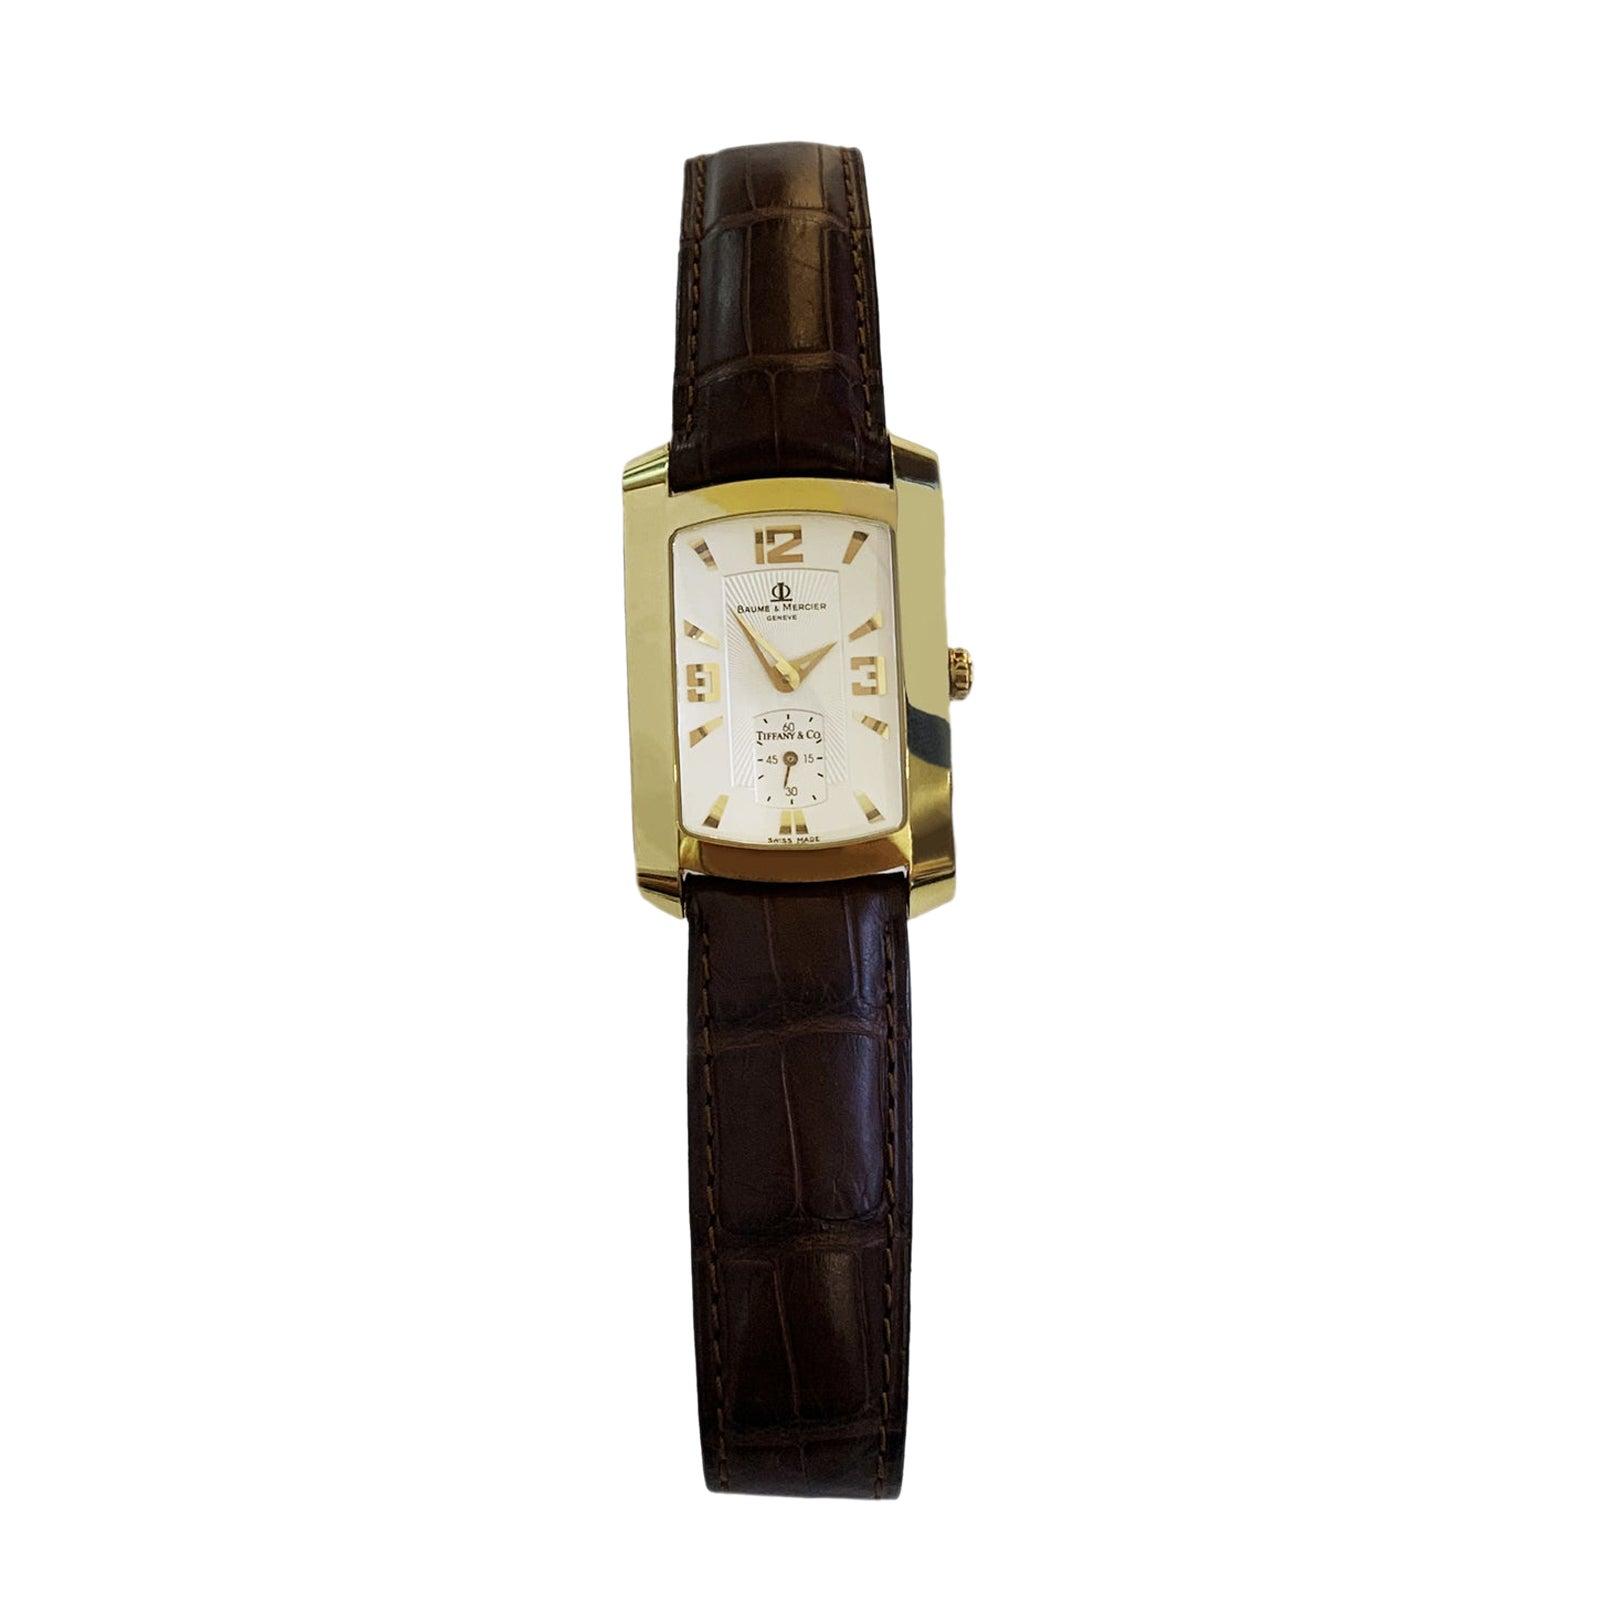 Baume & Mercier Tiffany 18k Gold Hampton Watch WV045224